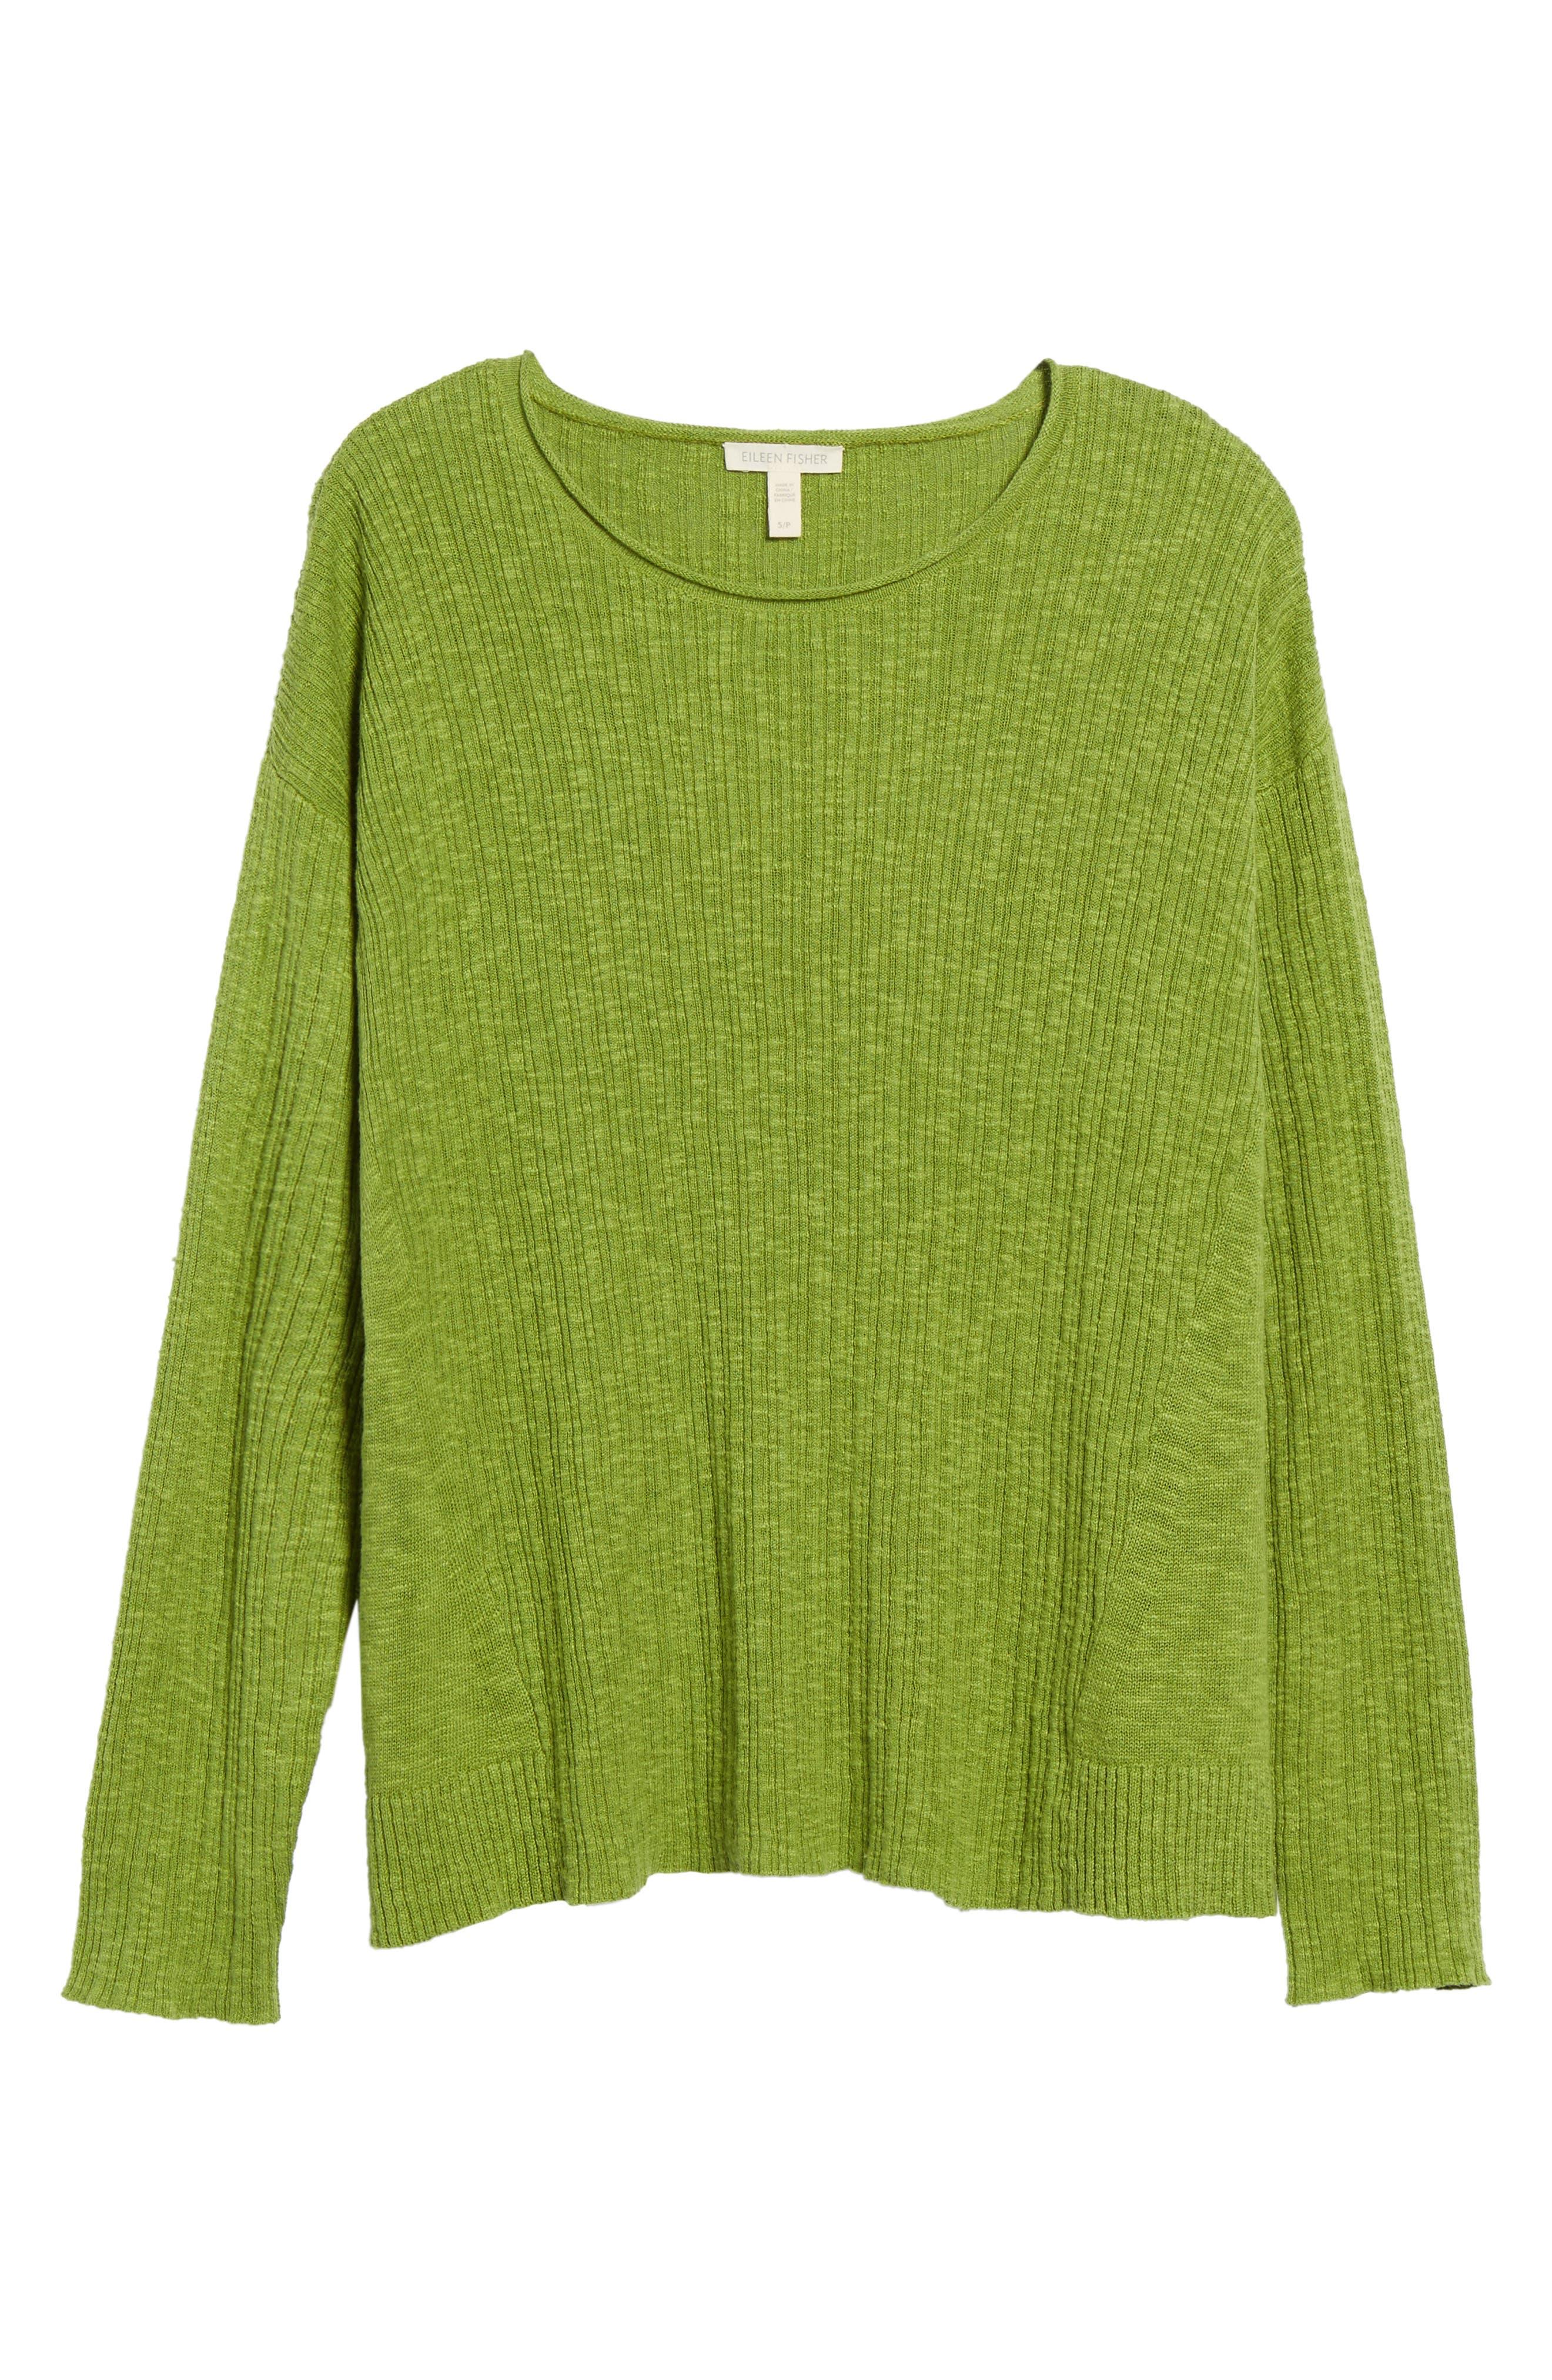 Organic Linen & Cotton Crewneck Sweater,                             Alternate thumbnail 28, color,